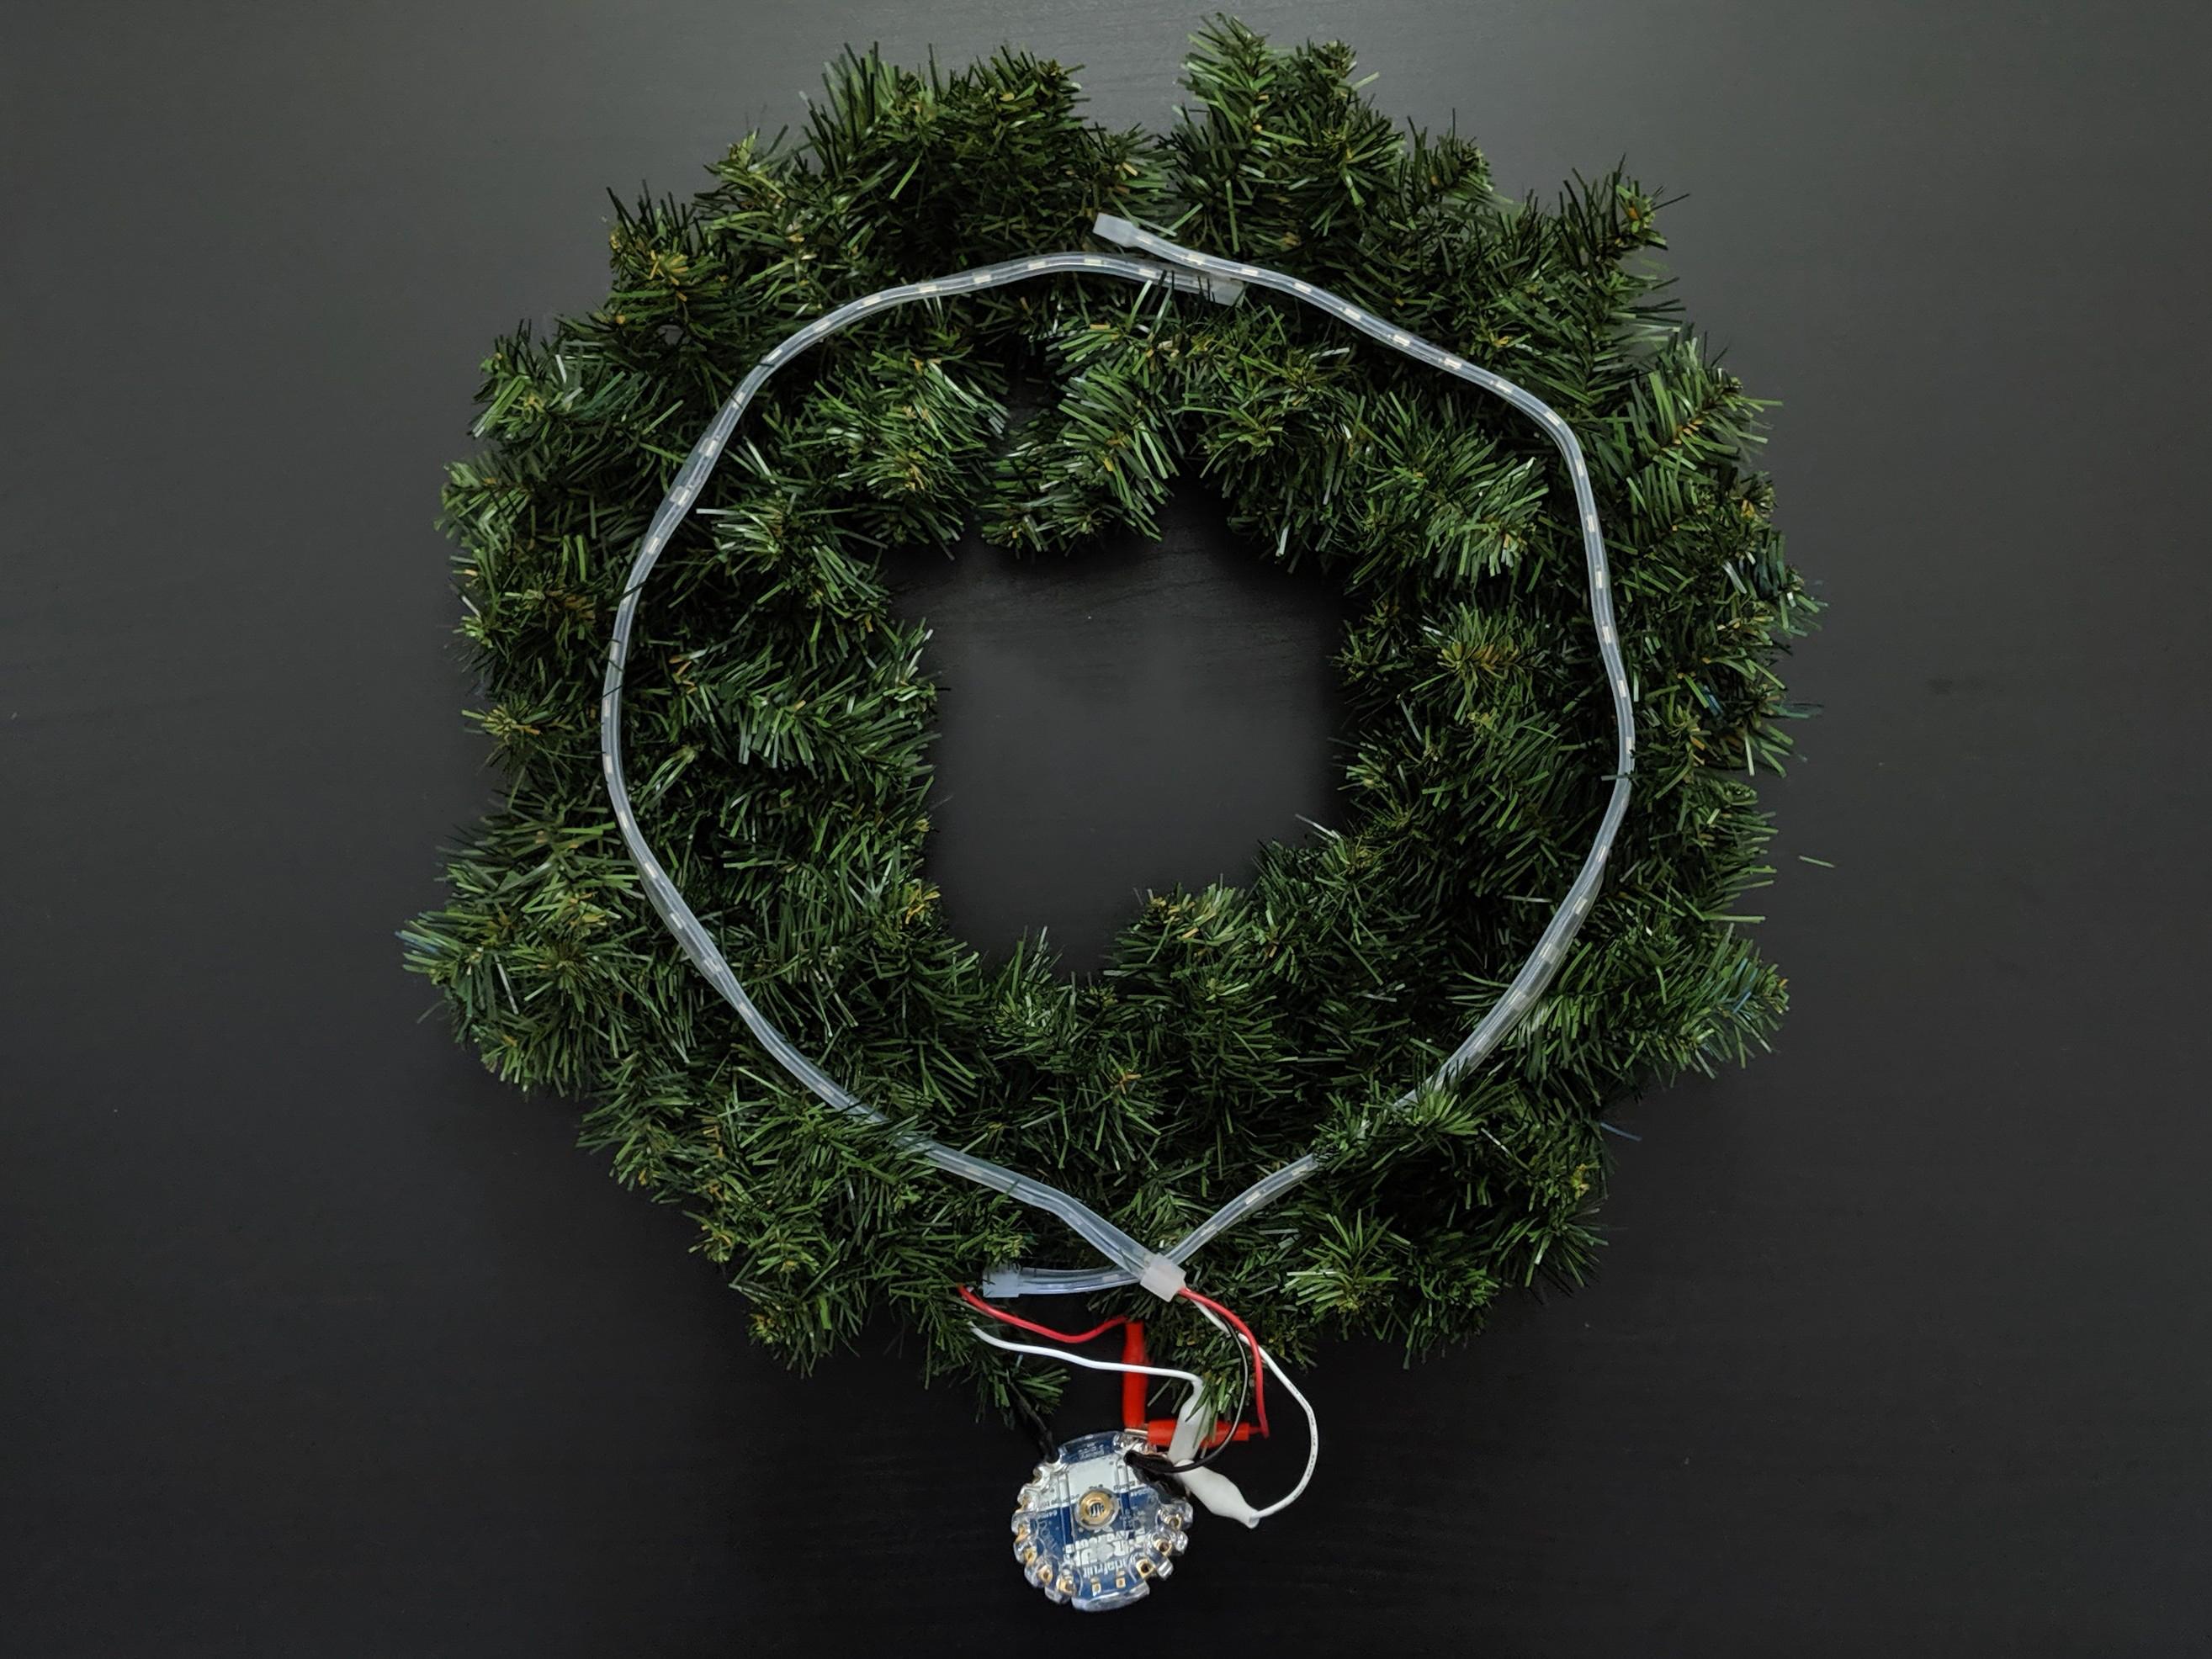 leds_CPB_NeoPIxel_Controller_strips_arranged_on_wreath.jpg